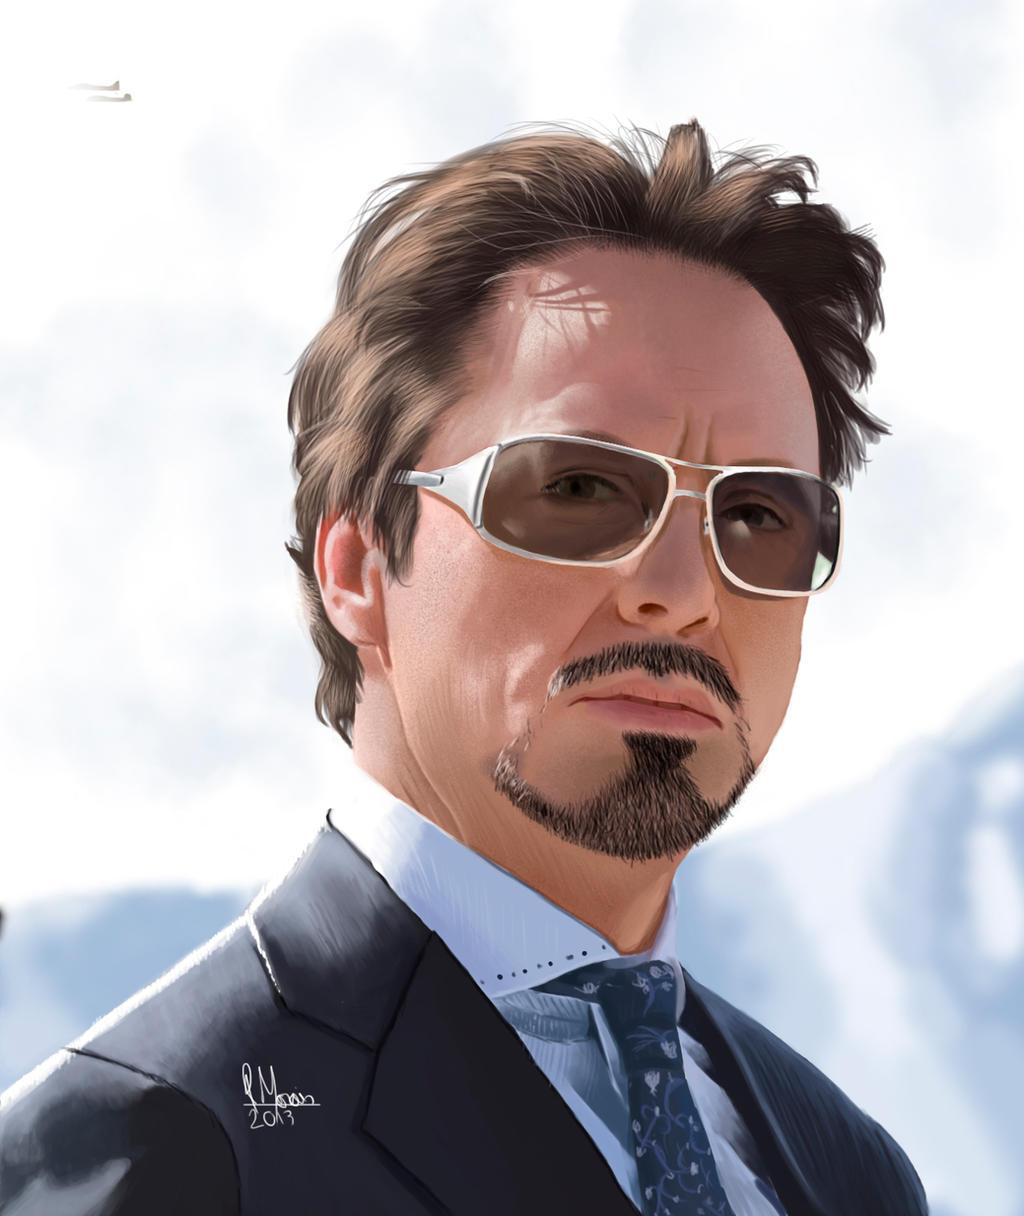 How to Draw Tony Stark Robert Downey Jr Iron Man 3 Step